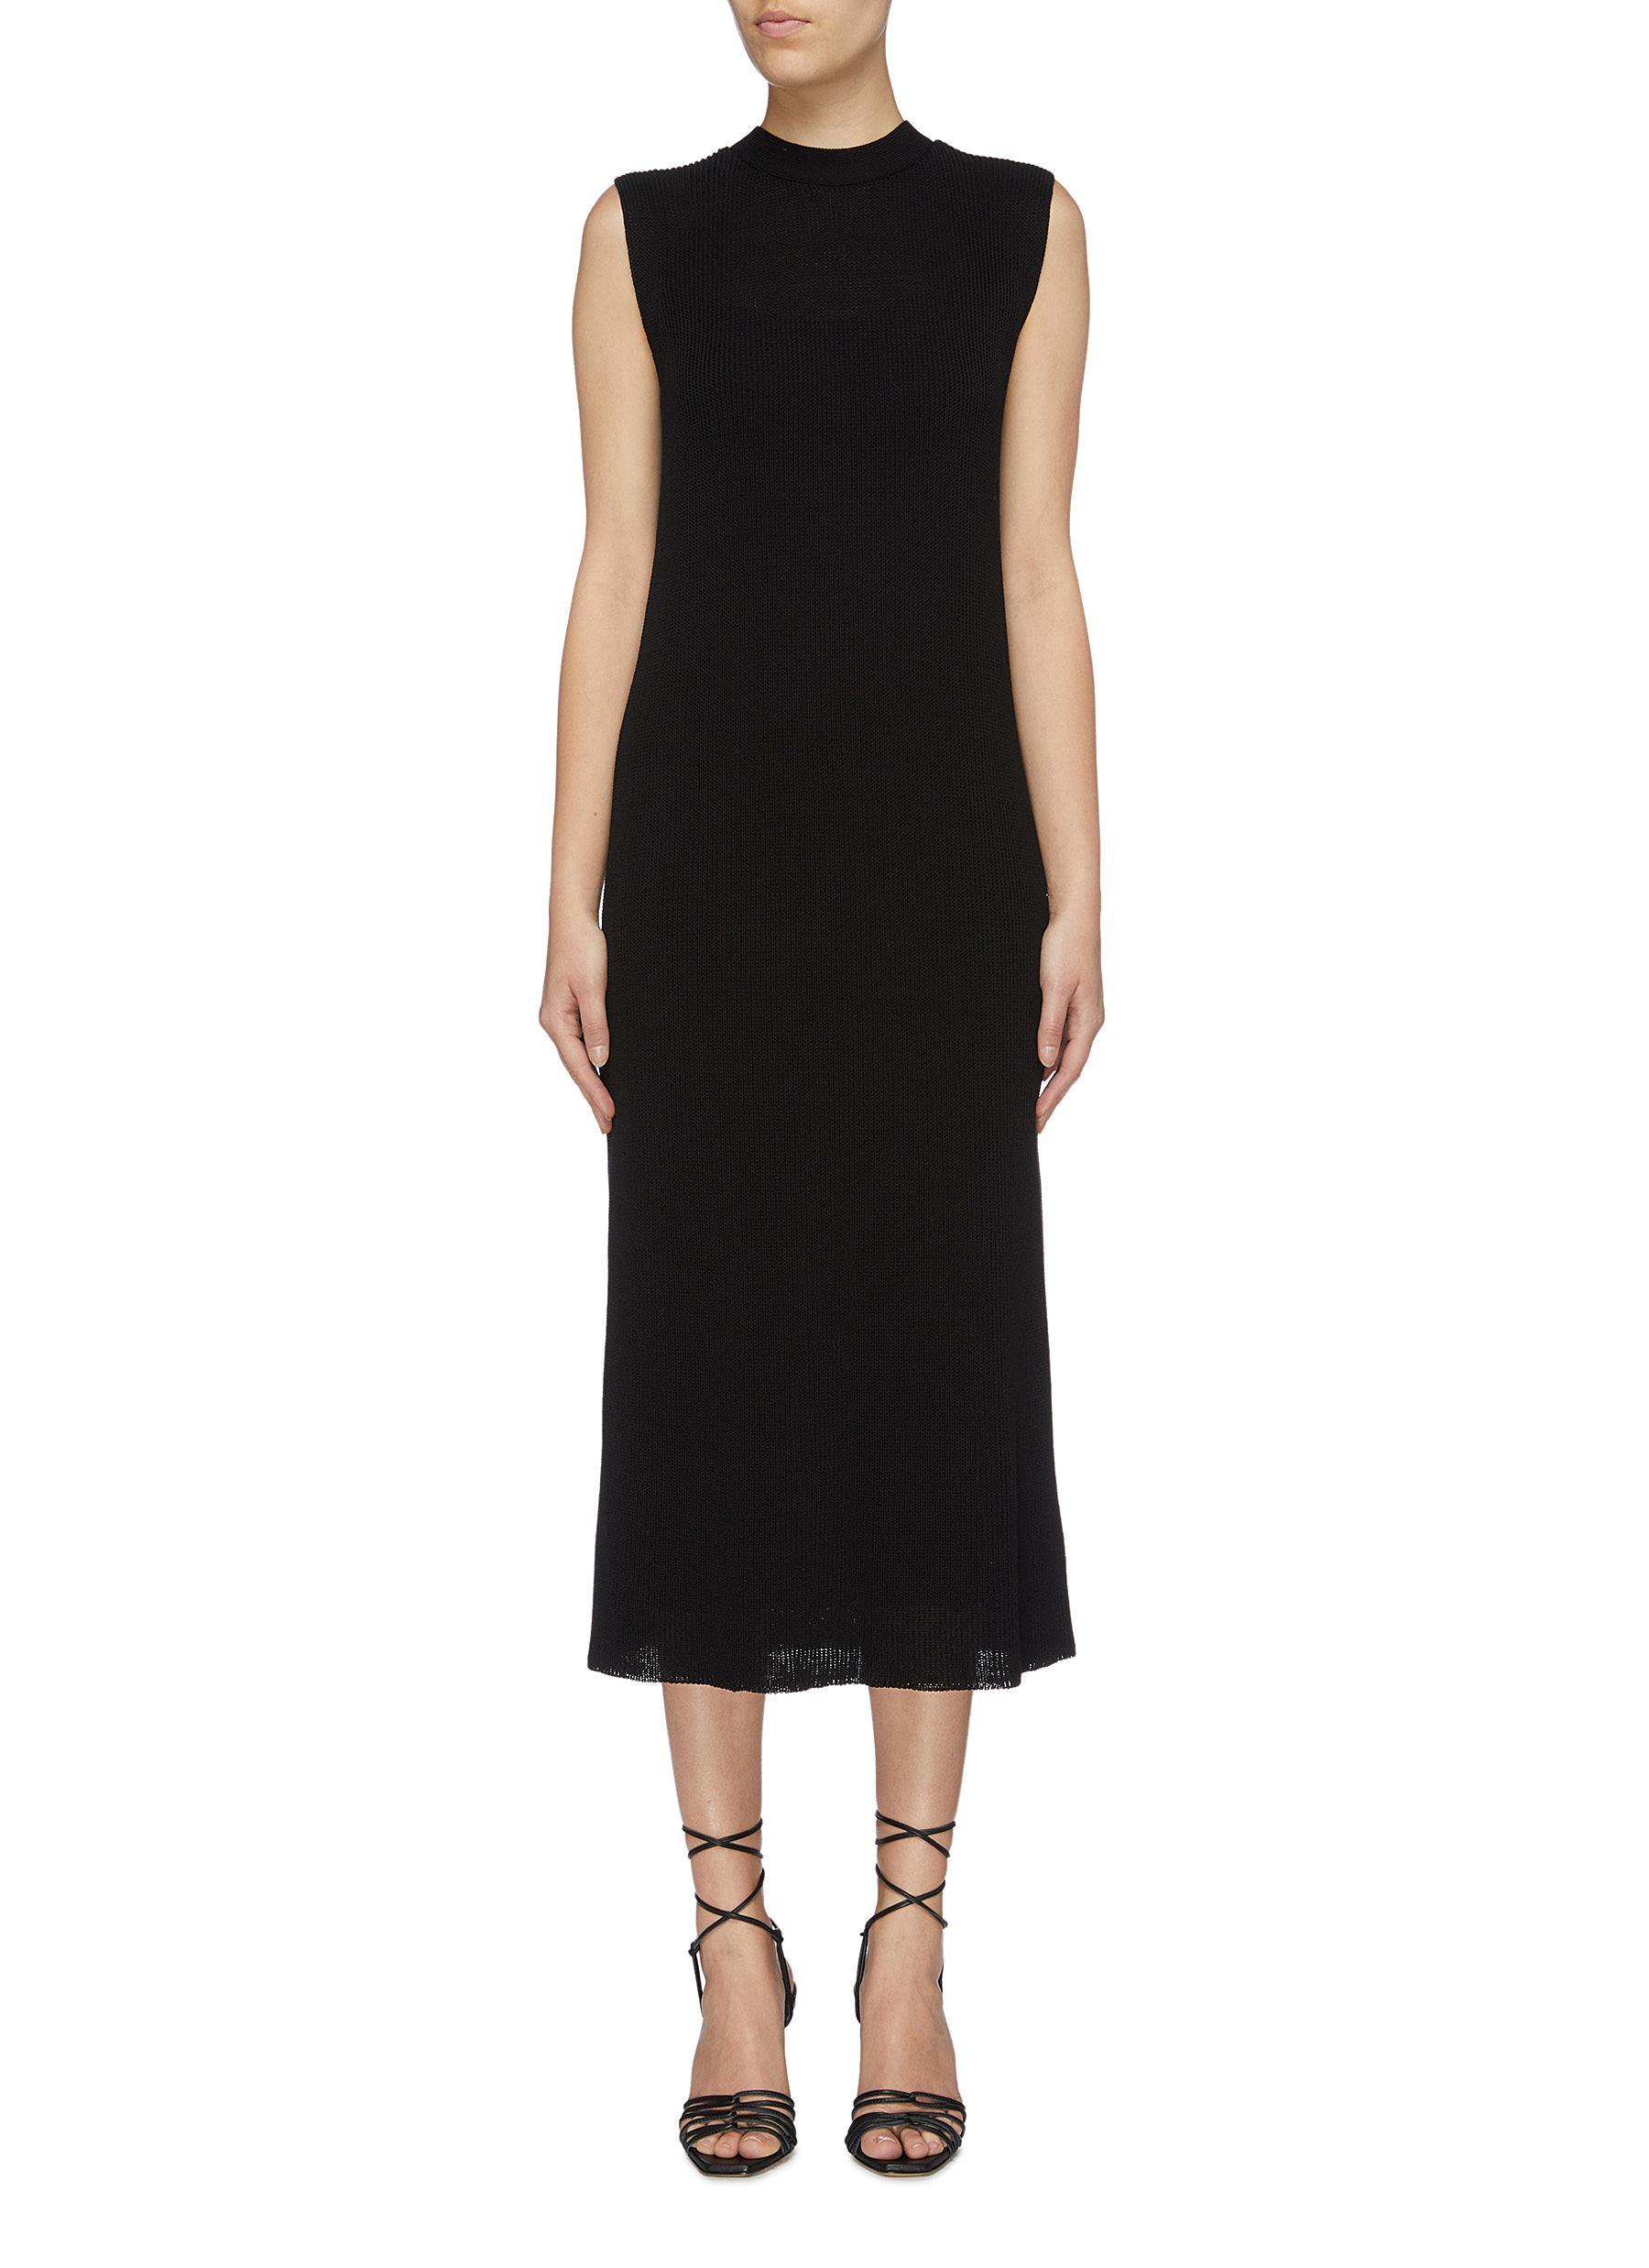 Bowen sleeveless silk-cotton knit dress by The Row